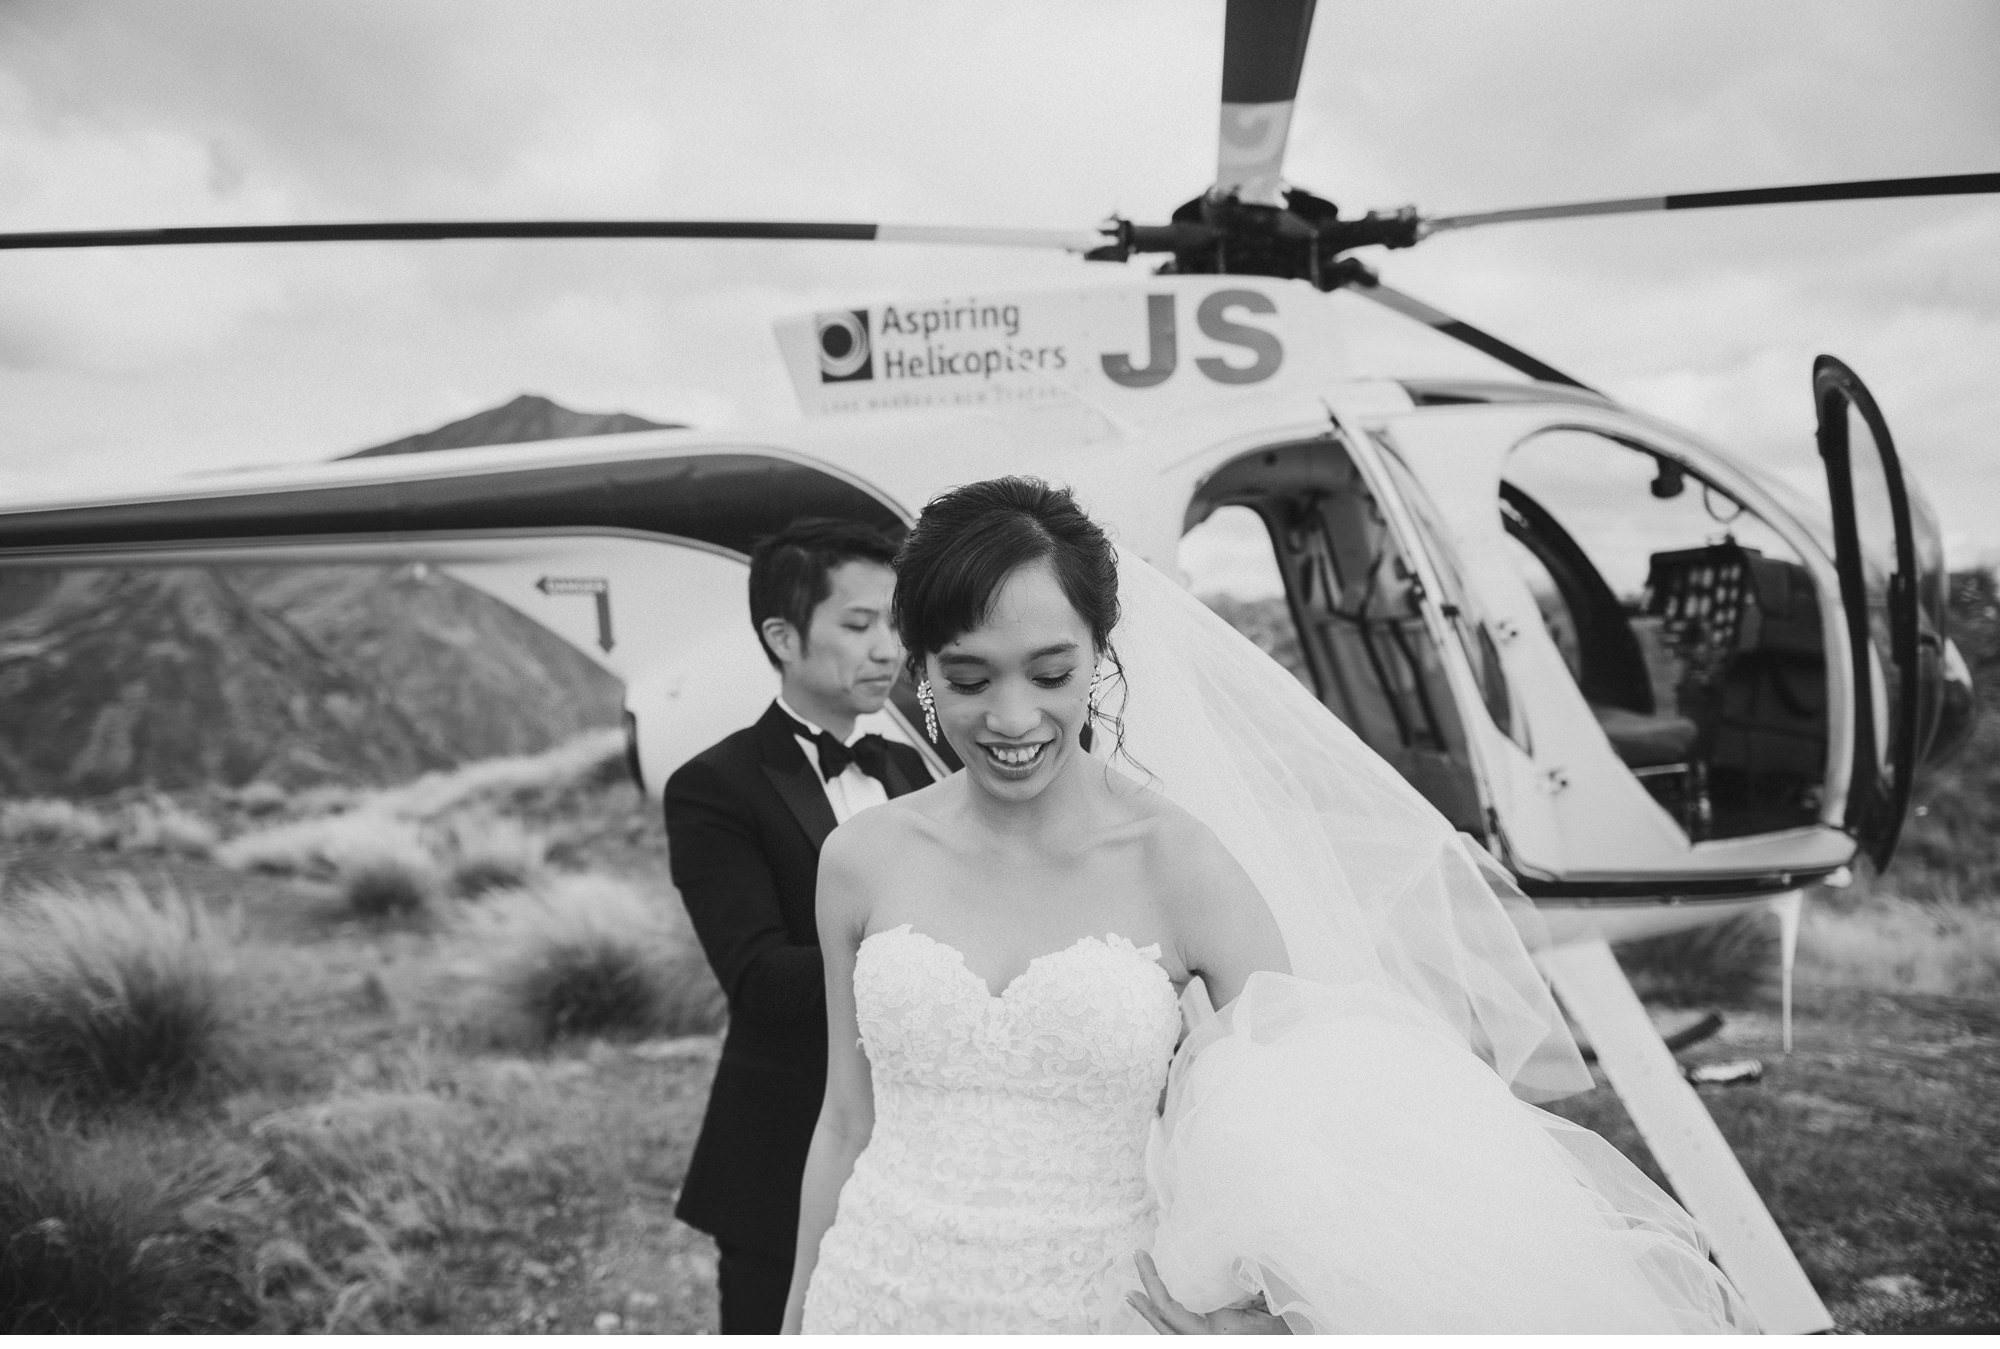 Isobel Glacier Pre Wedding Photography-005.jpg